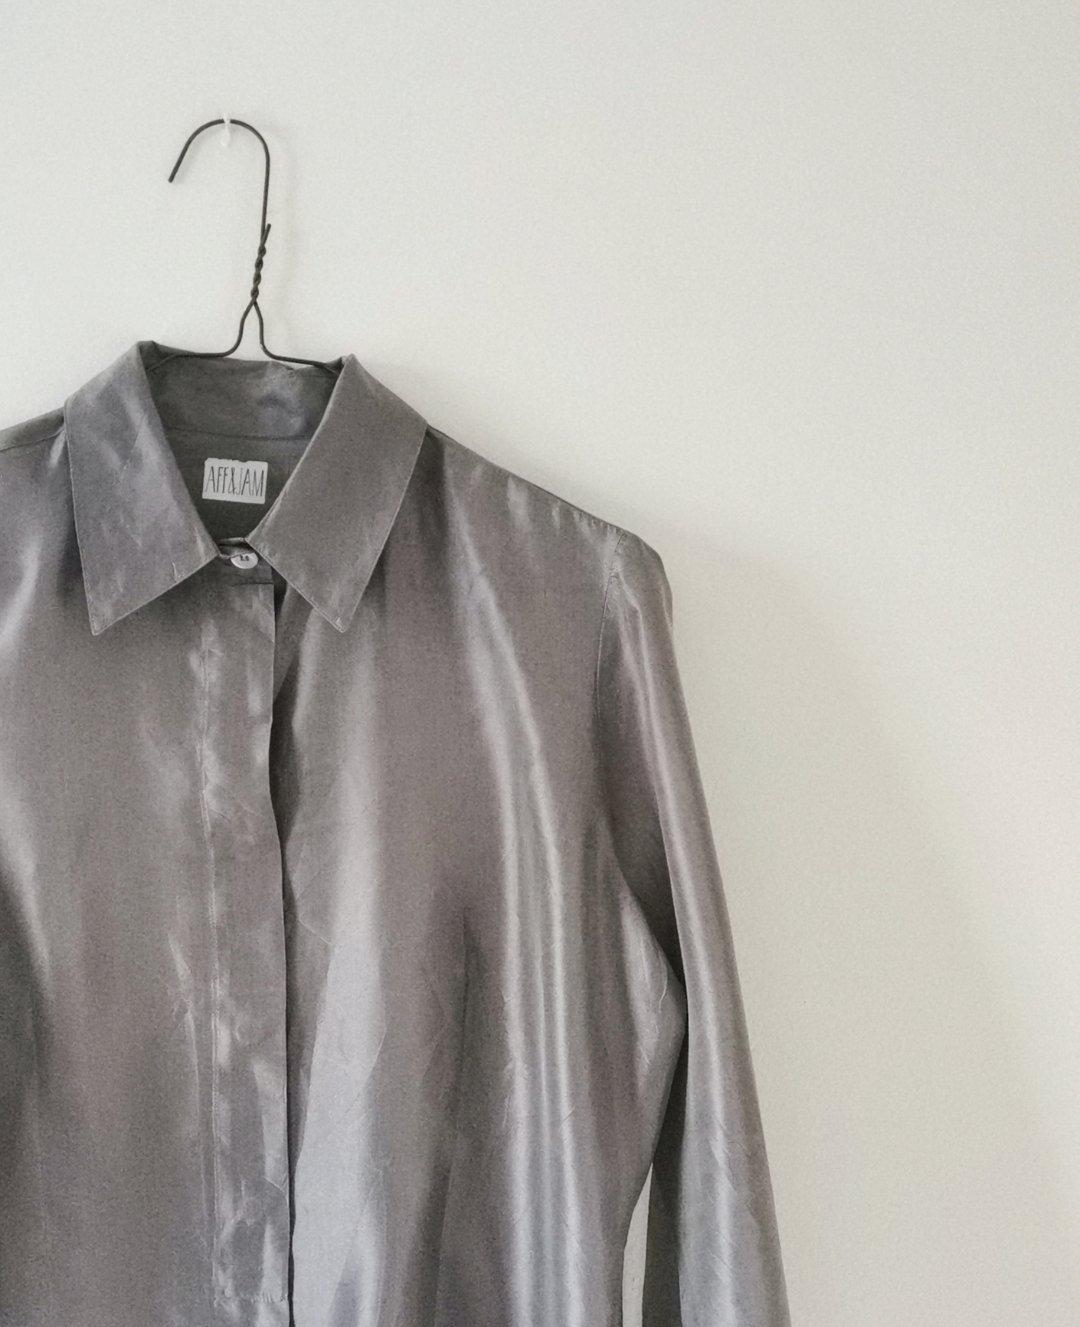 Image of dutchie shirt